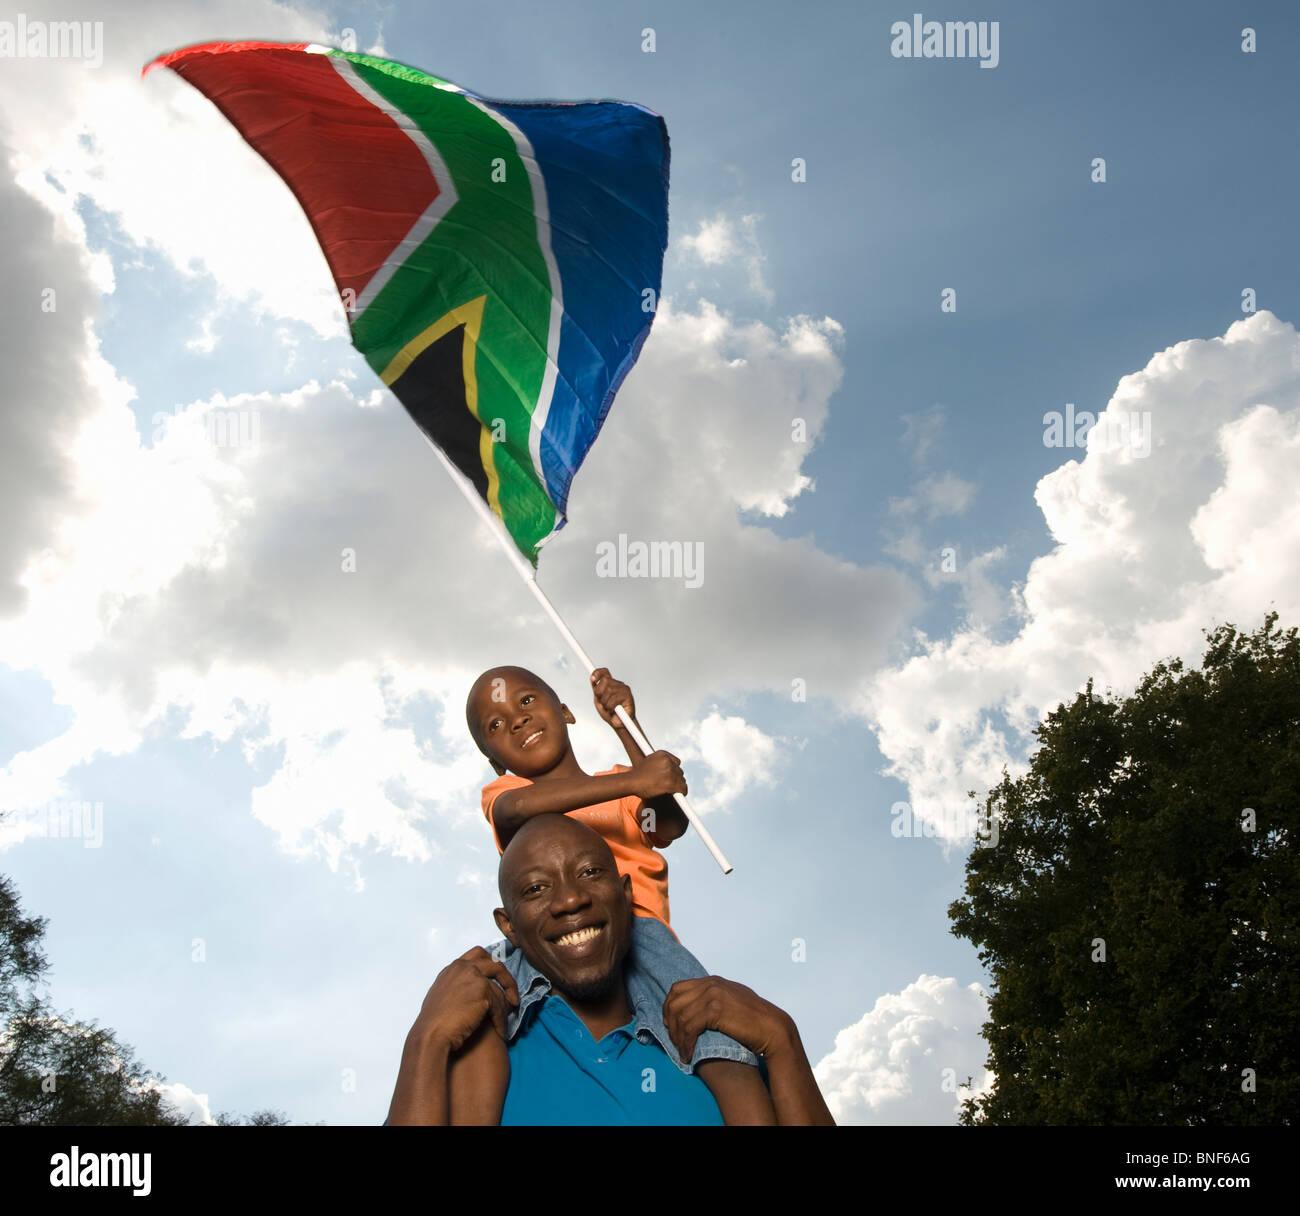 Vater mit Sohn (4-5) auf Schultern, winken südafrikanische Flagge, Johannesburg, Provinz Gauteng, Südafrika Stockbild